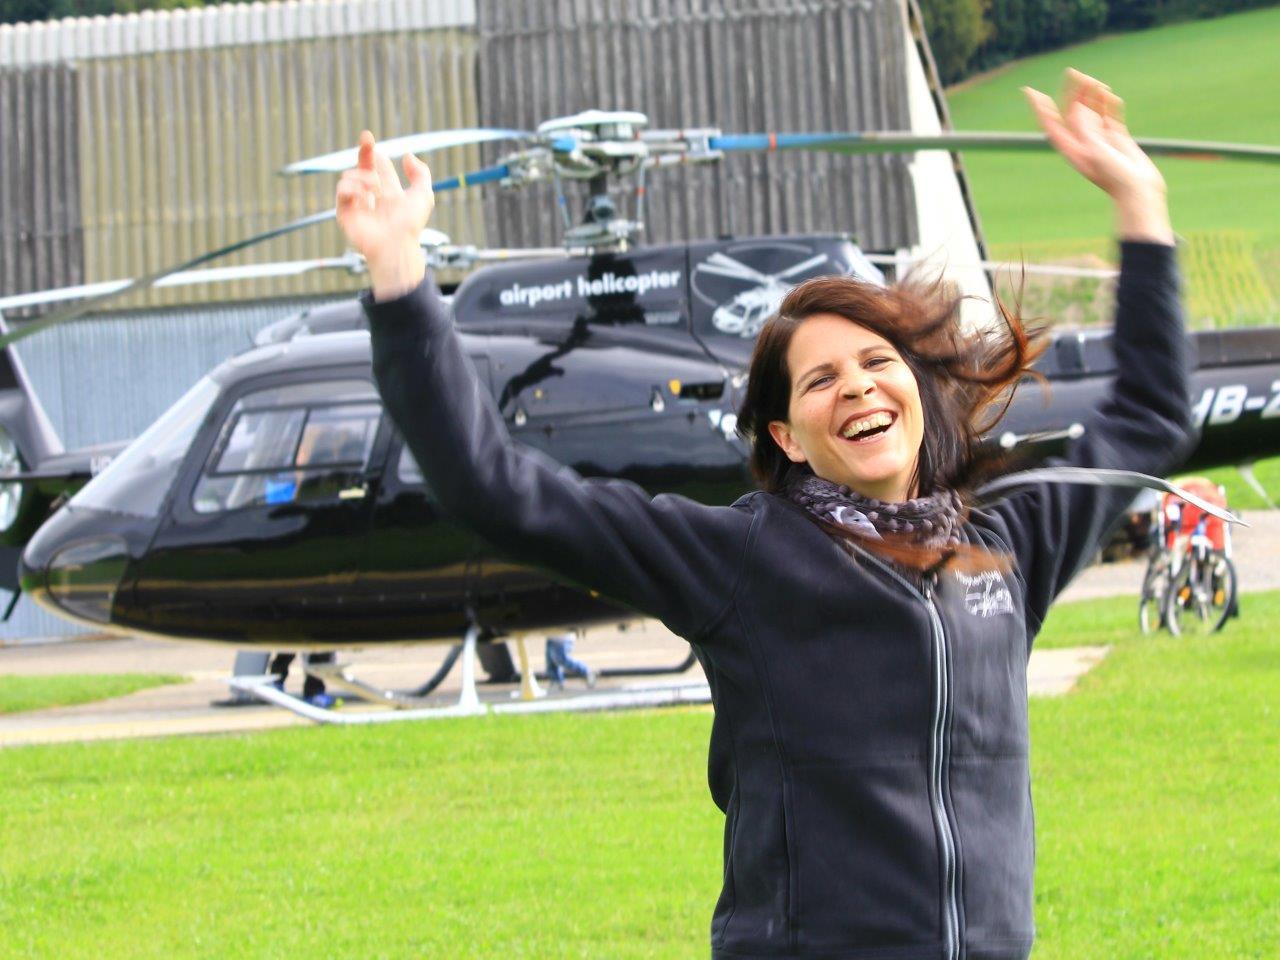 Hubschrauber selber fliegen Freude Airleben